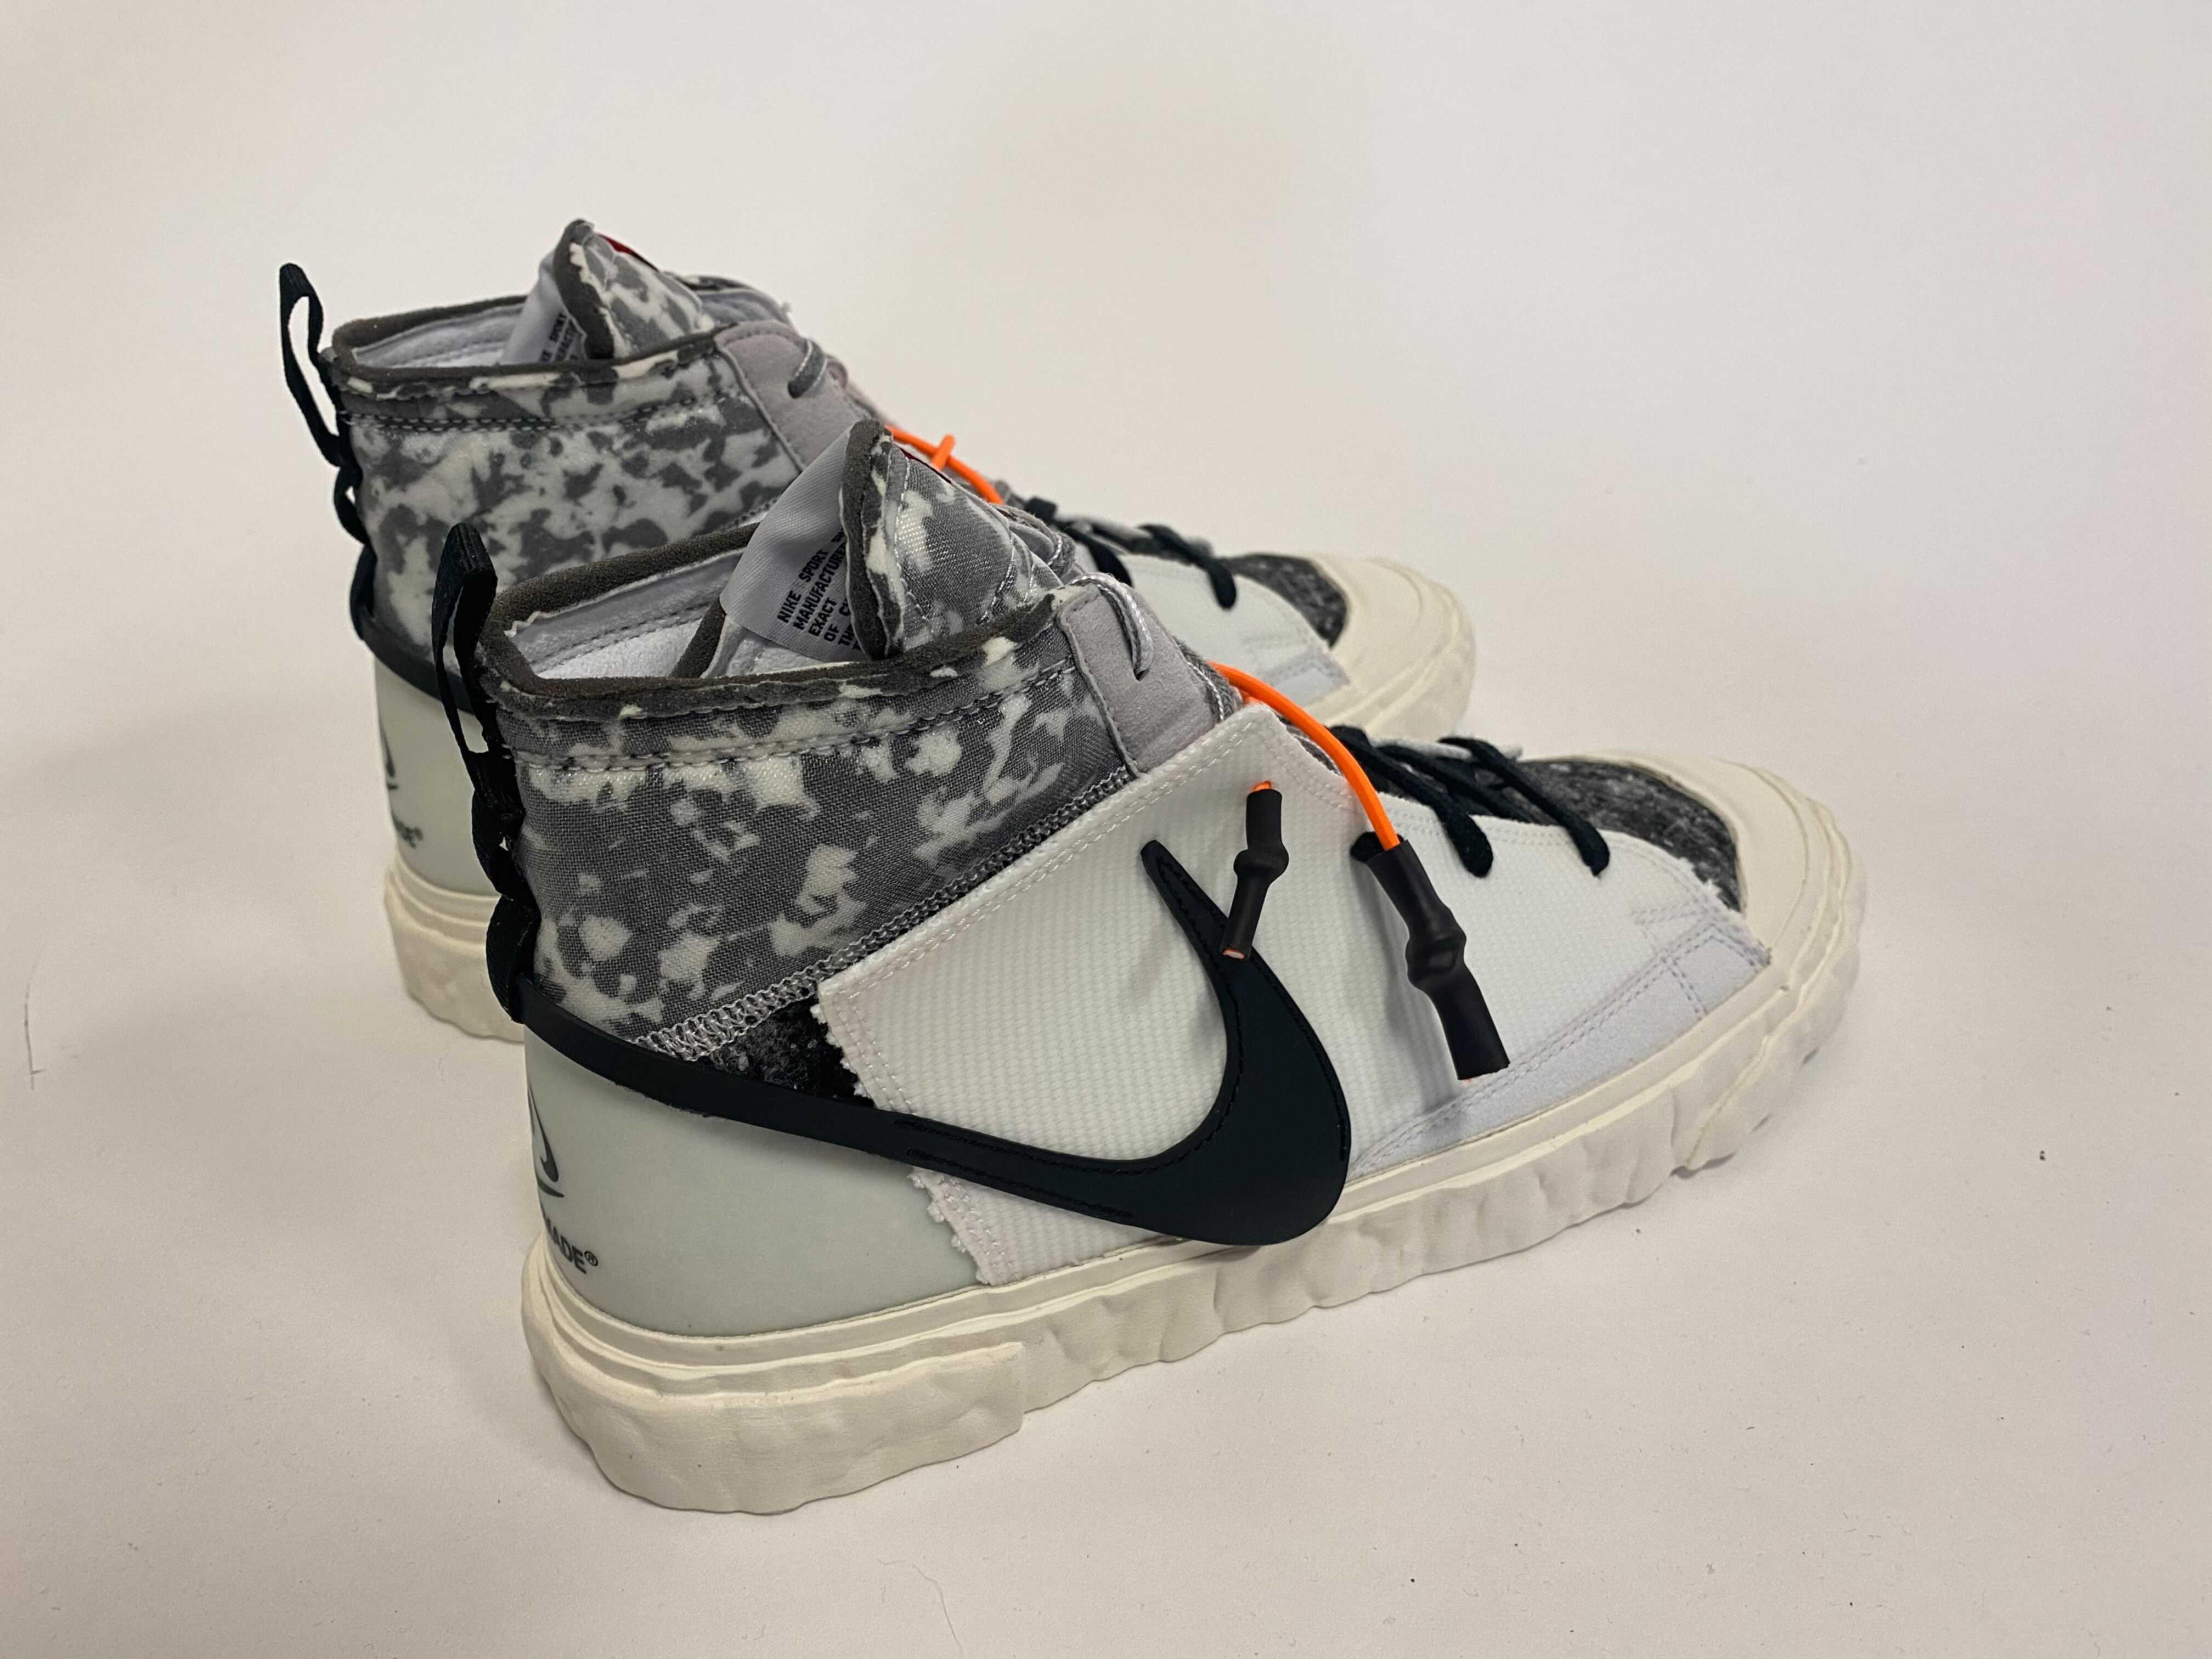 Readymade x Nike Blazer Mid 'White' (Lateral)